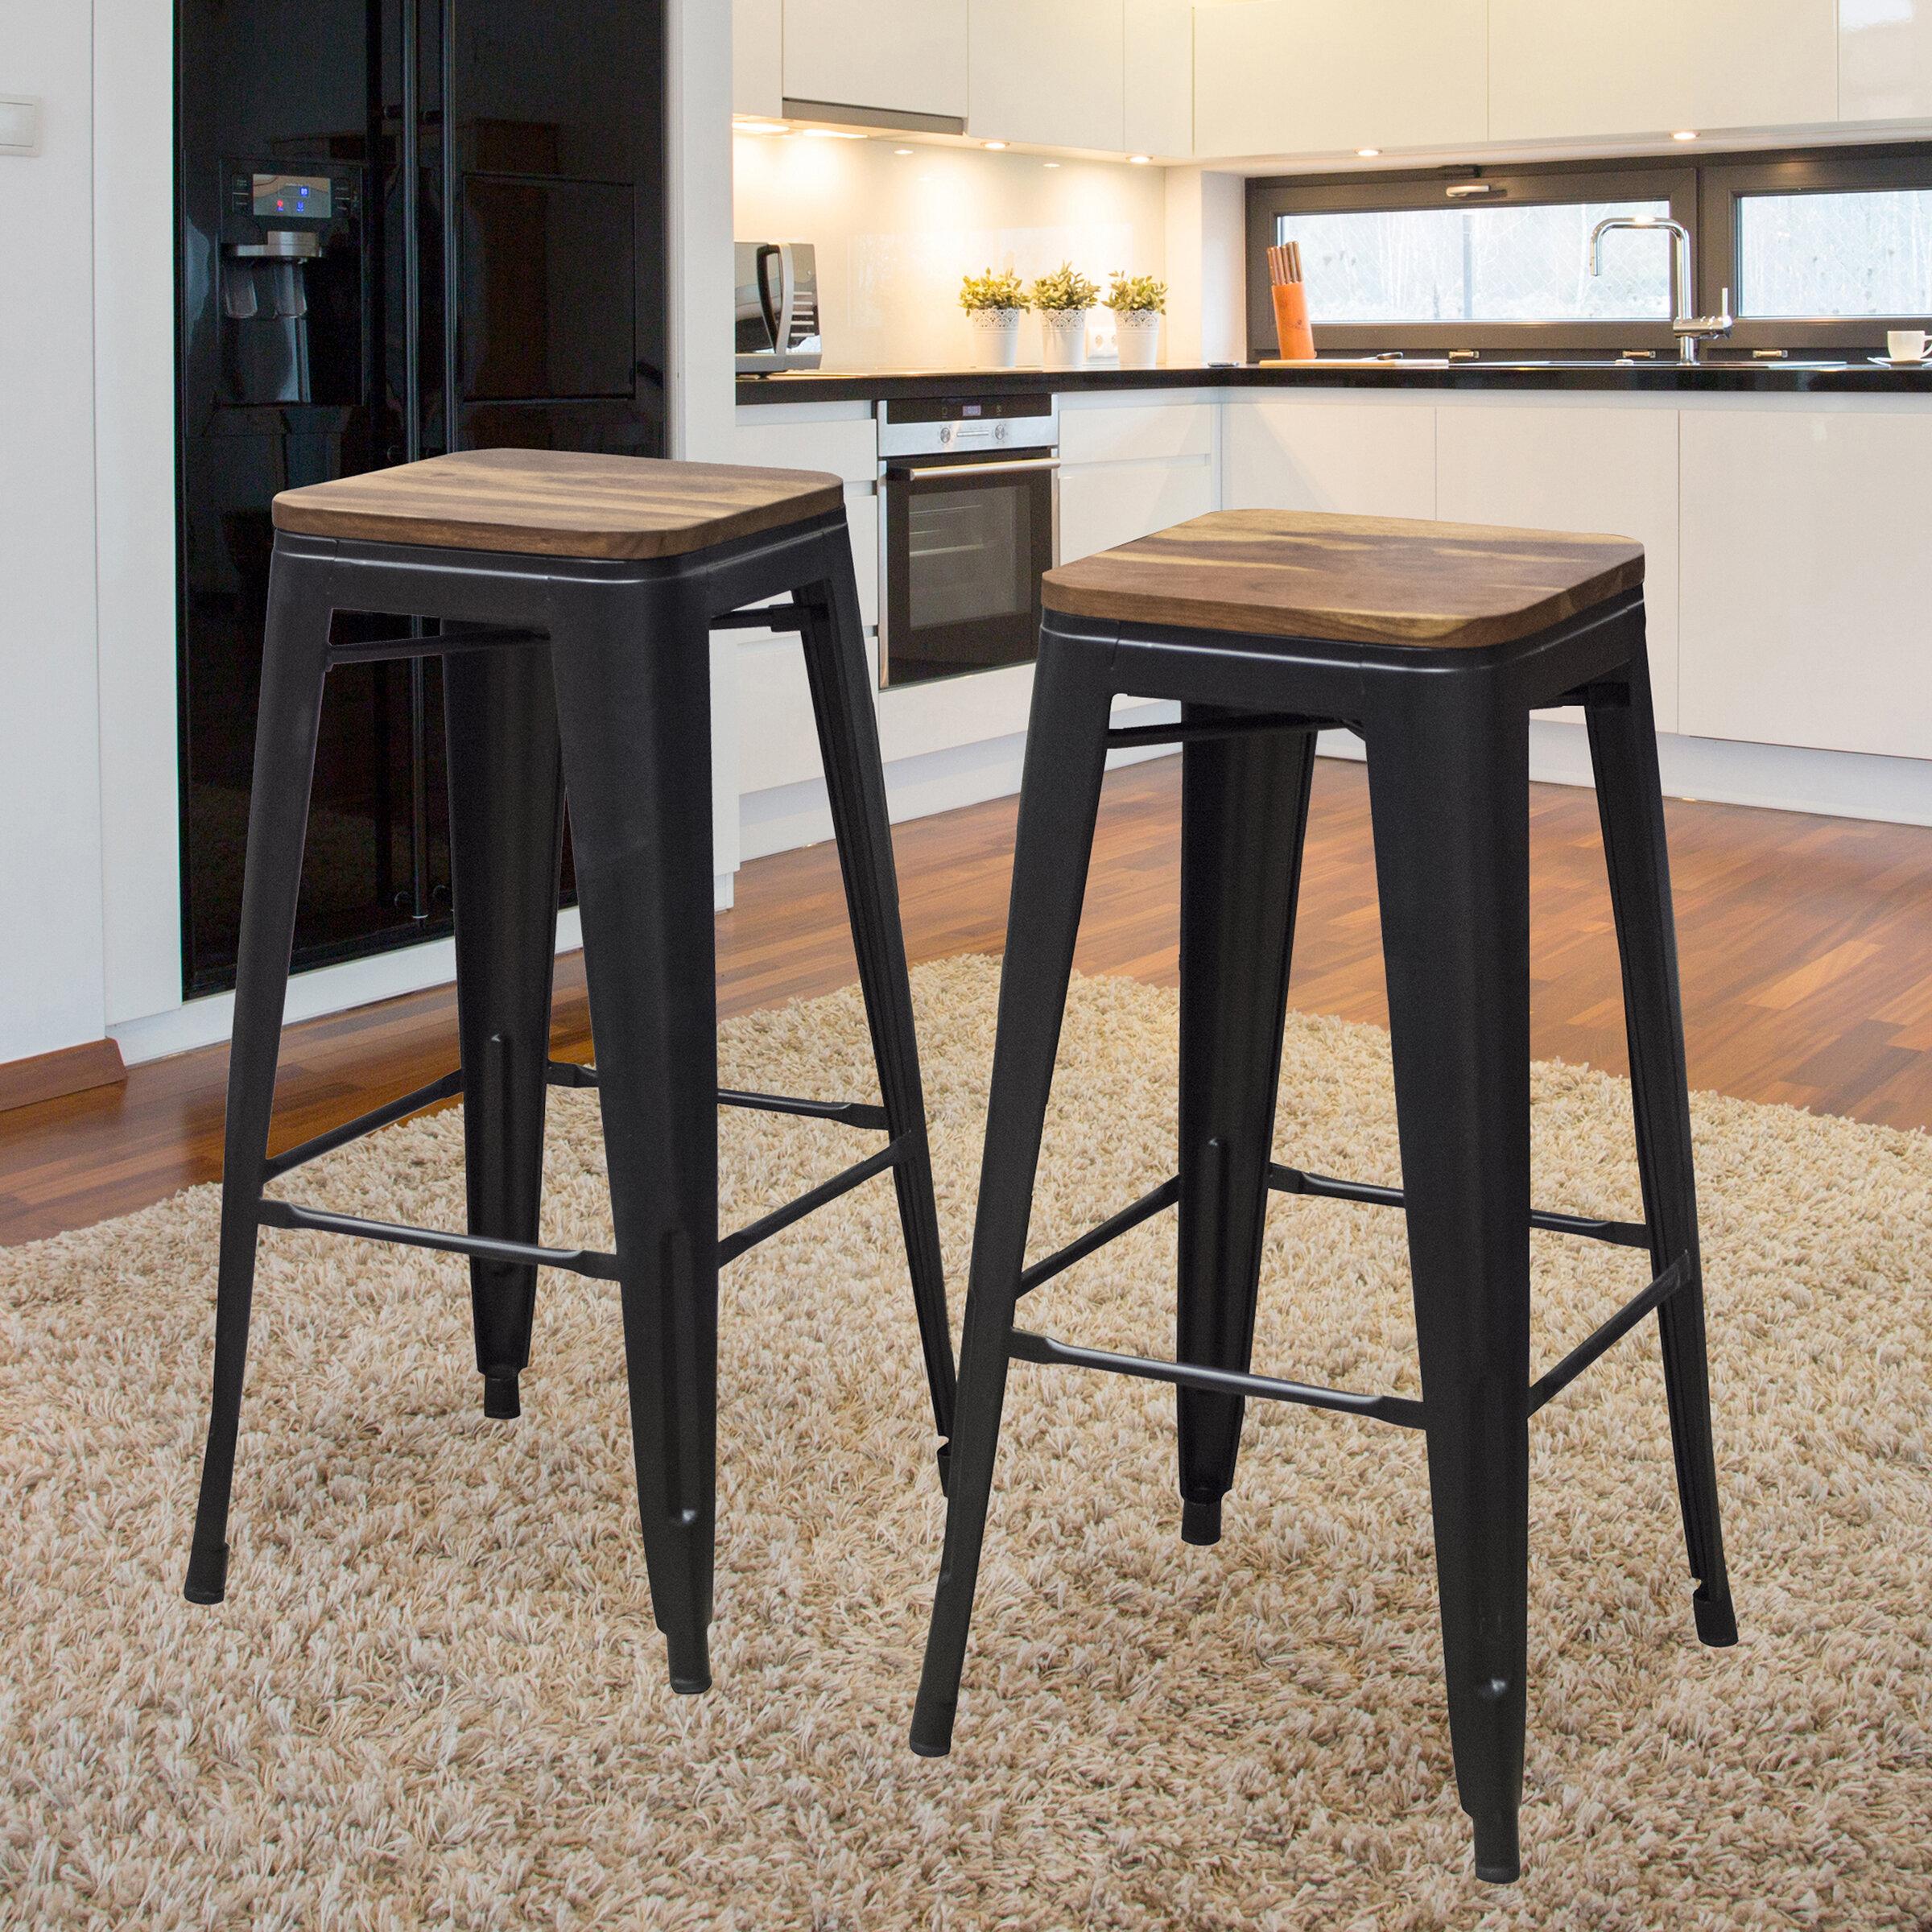 Take Me Home Furniture Tolix Barstool 30 H Black Set of 4 in Black